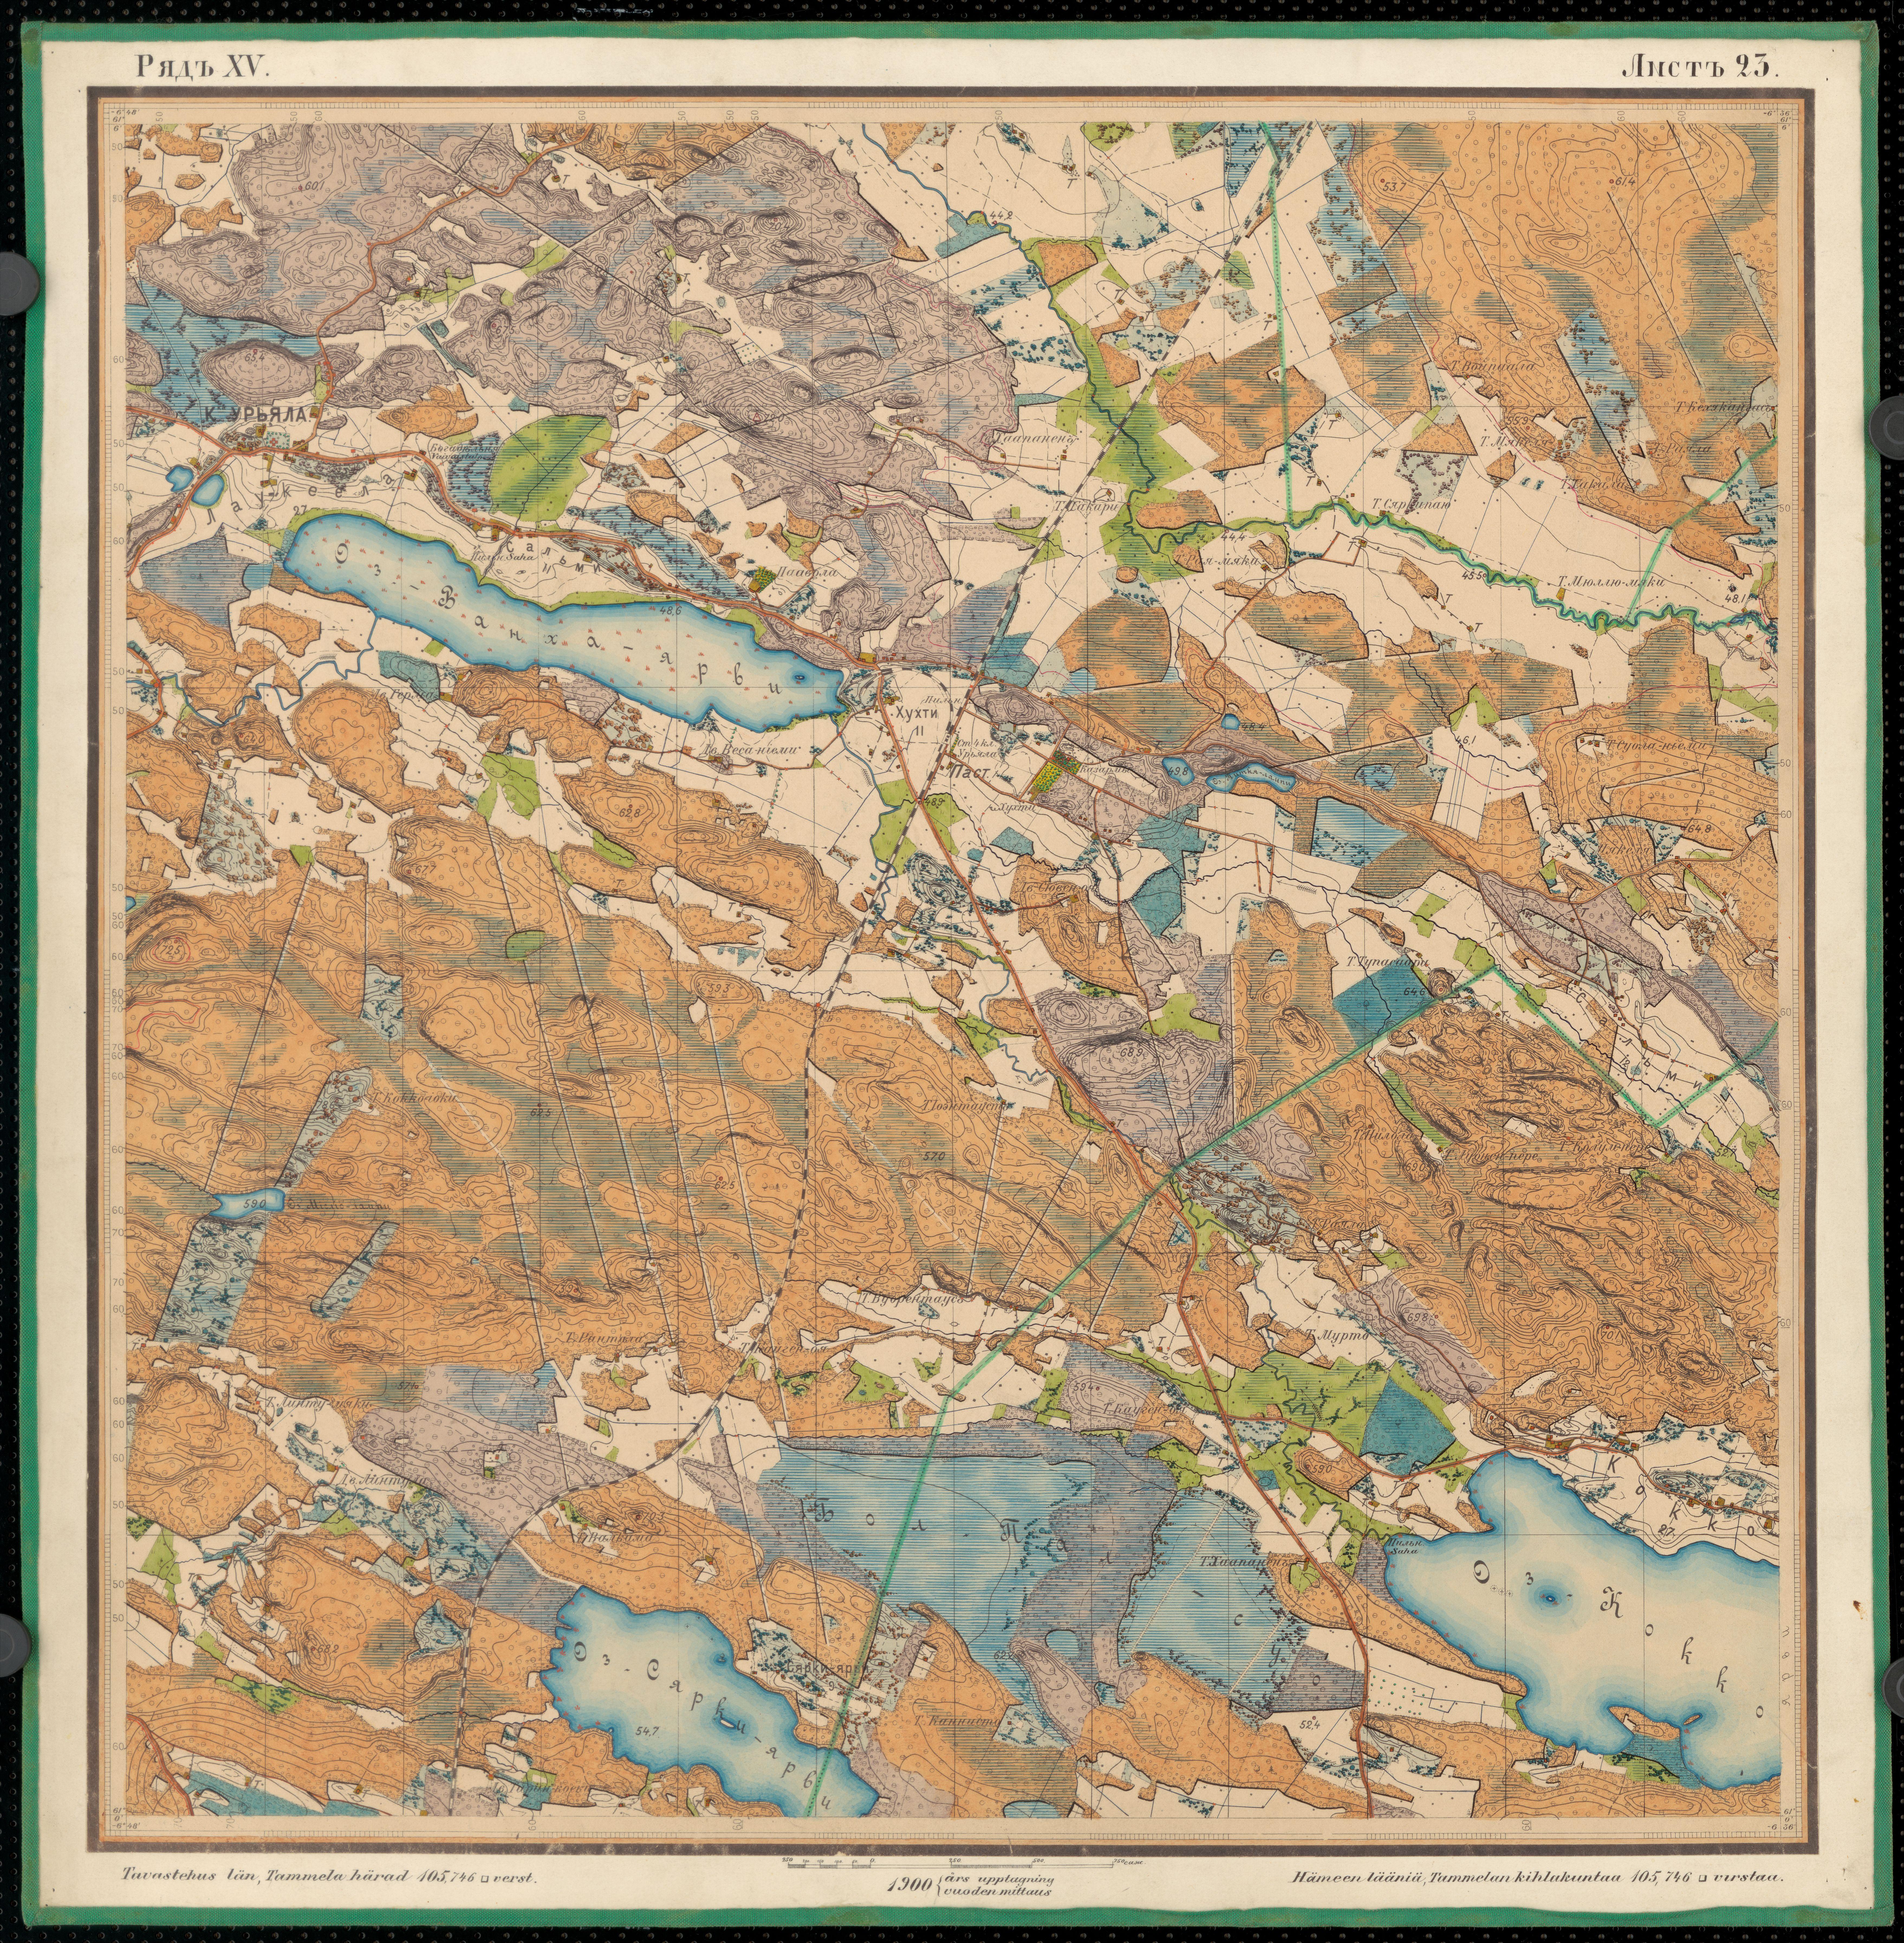 File Senate Atlas 1870 1907 Sheet Xv 23 Urjala Jpg Wikimedia